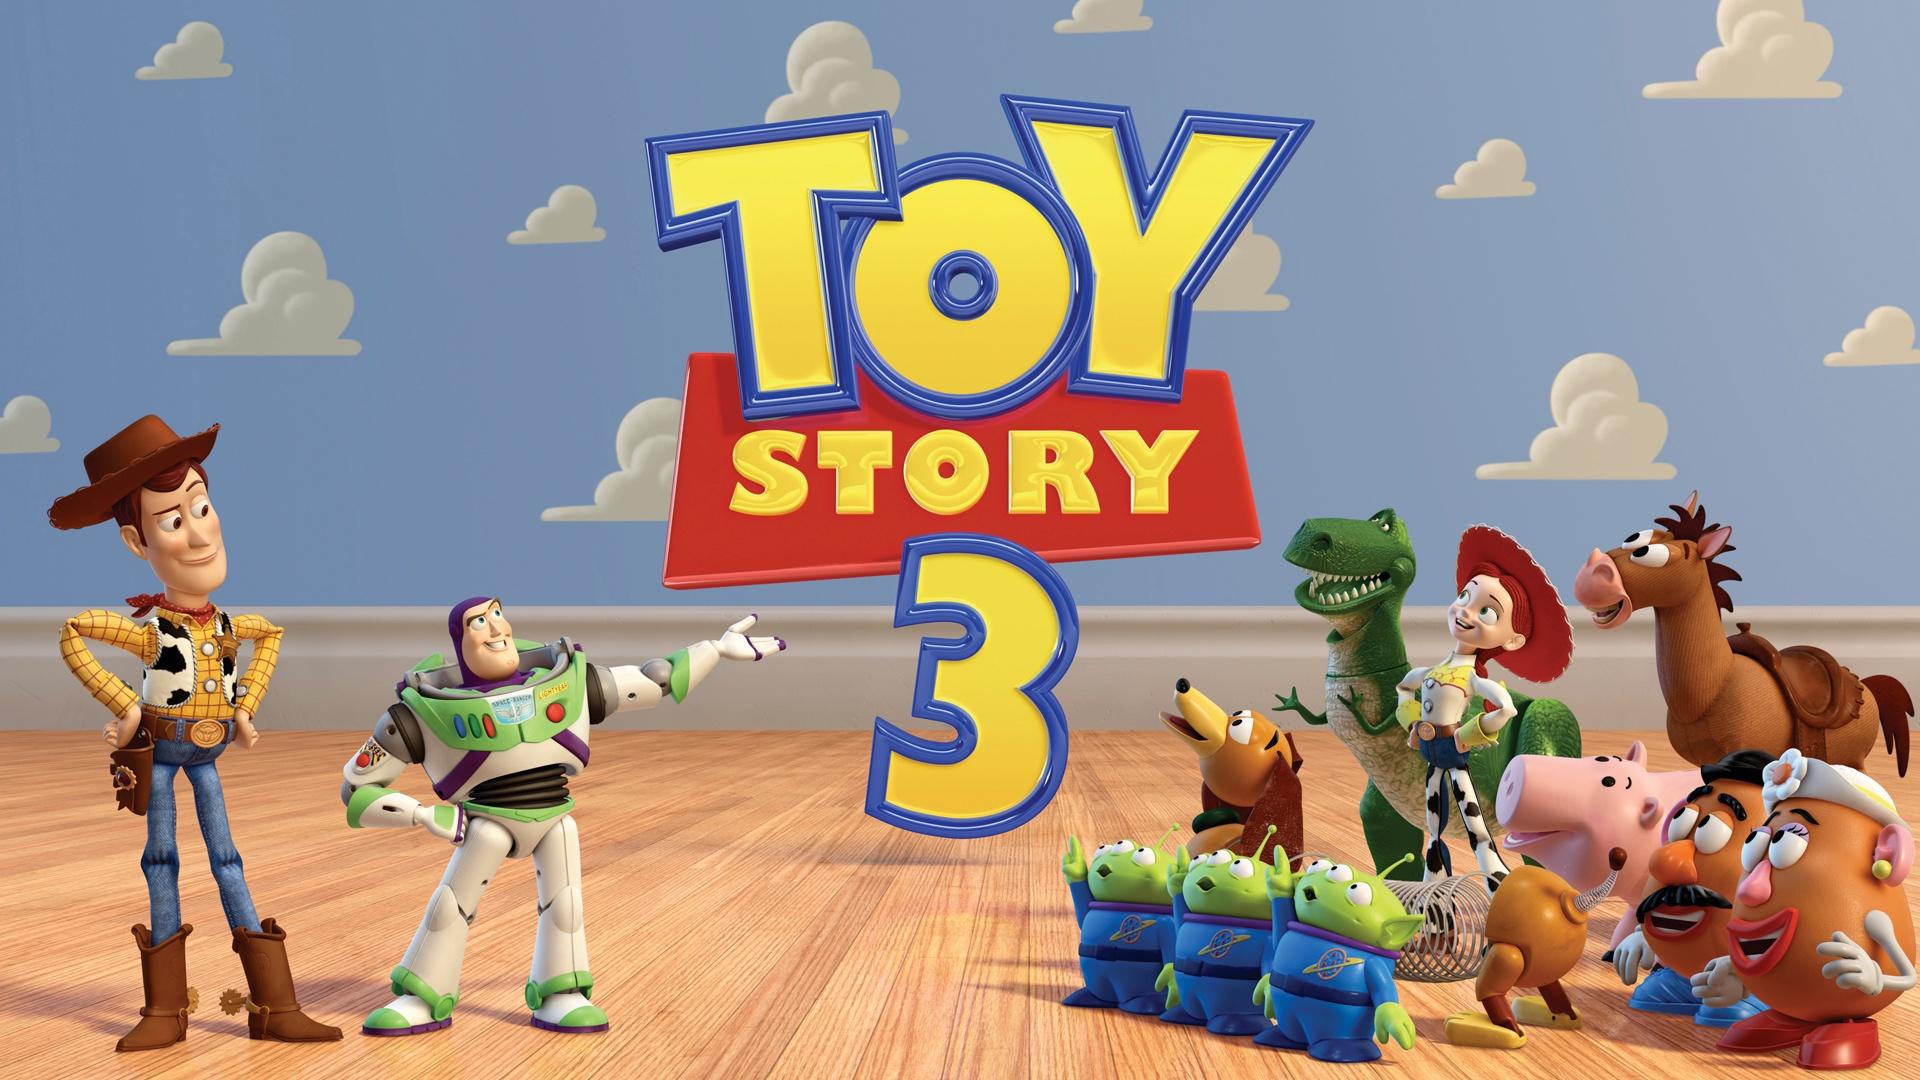 toy_story_3-1920x1080